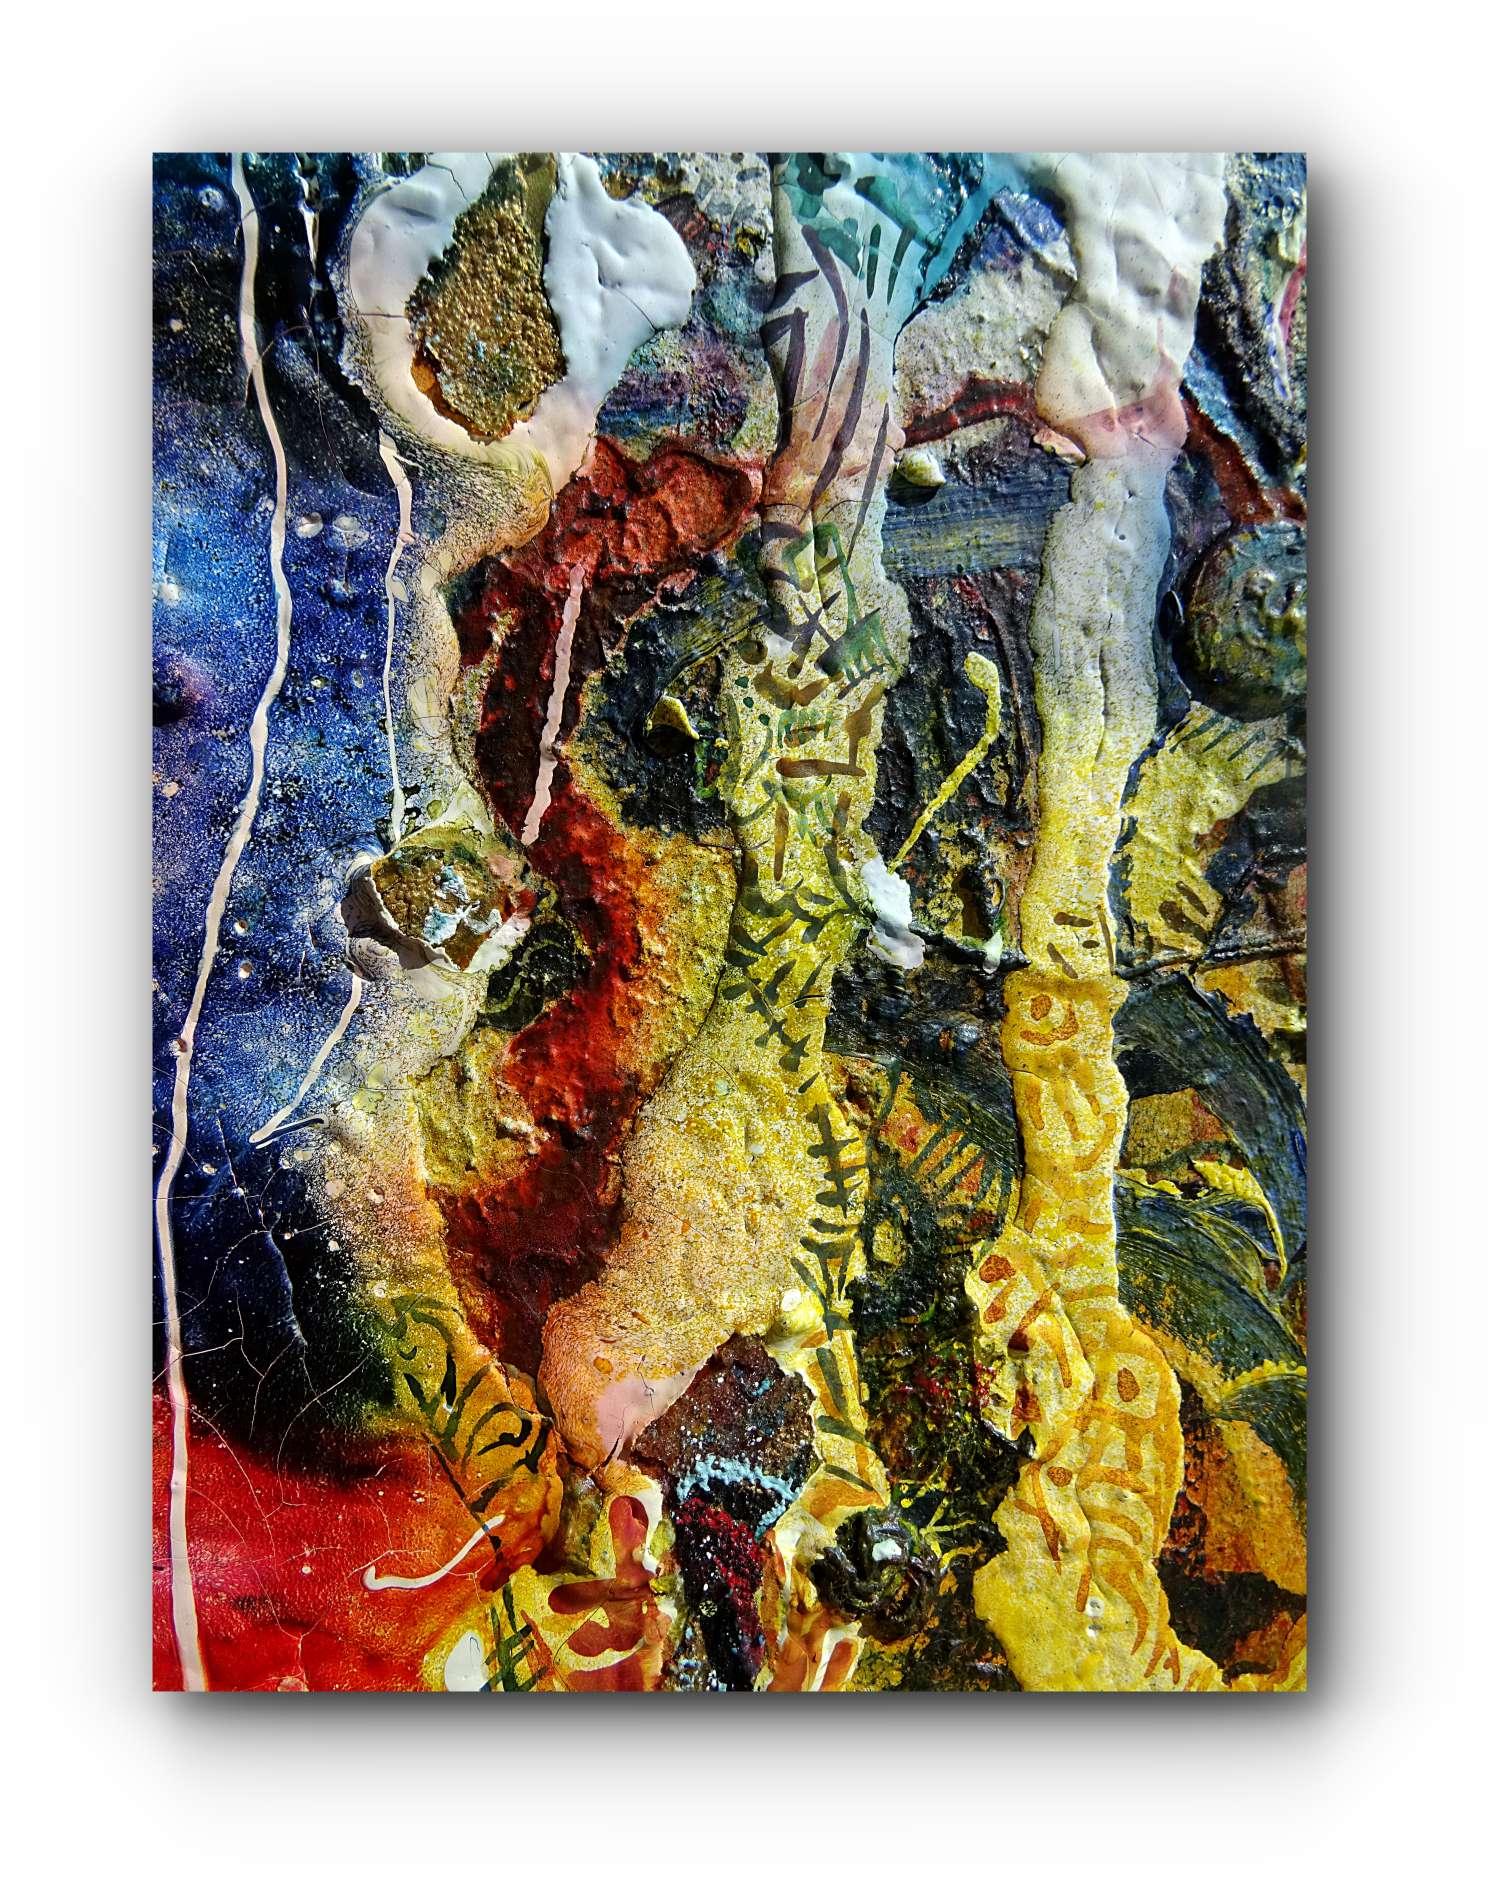 painting-detail-6-kiss-artist-duo-ingress-vortices.jpg